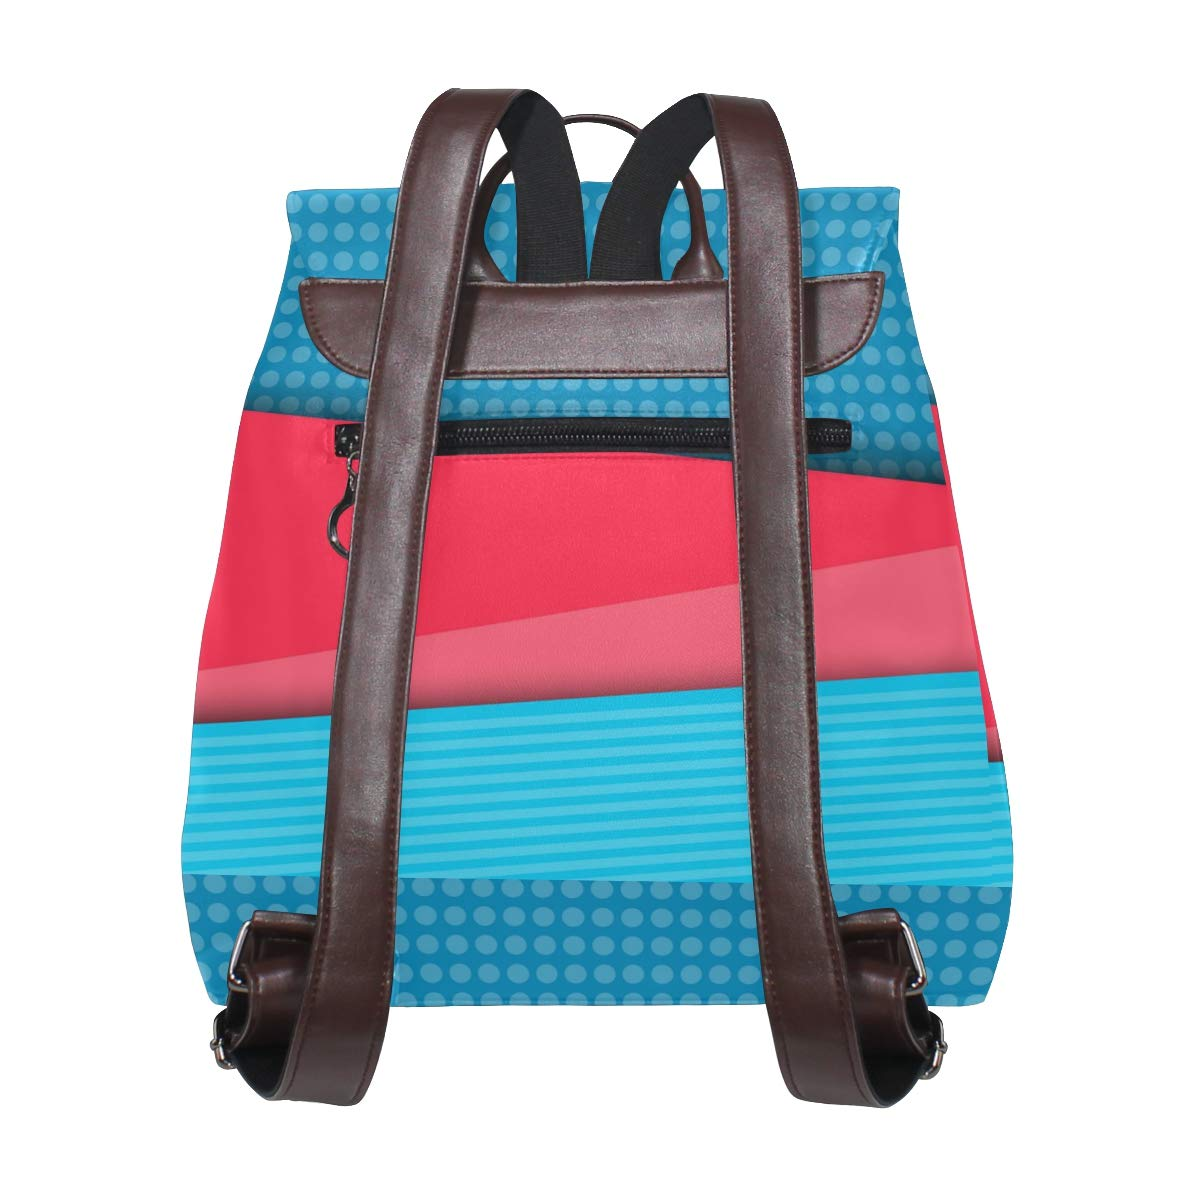 PU Leather Shoulder Bag,Blue Red Backpack,Portable Travel School Rucksack,Satchel with Top Handle